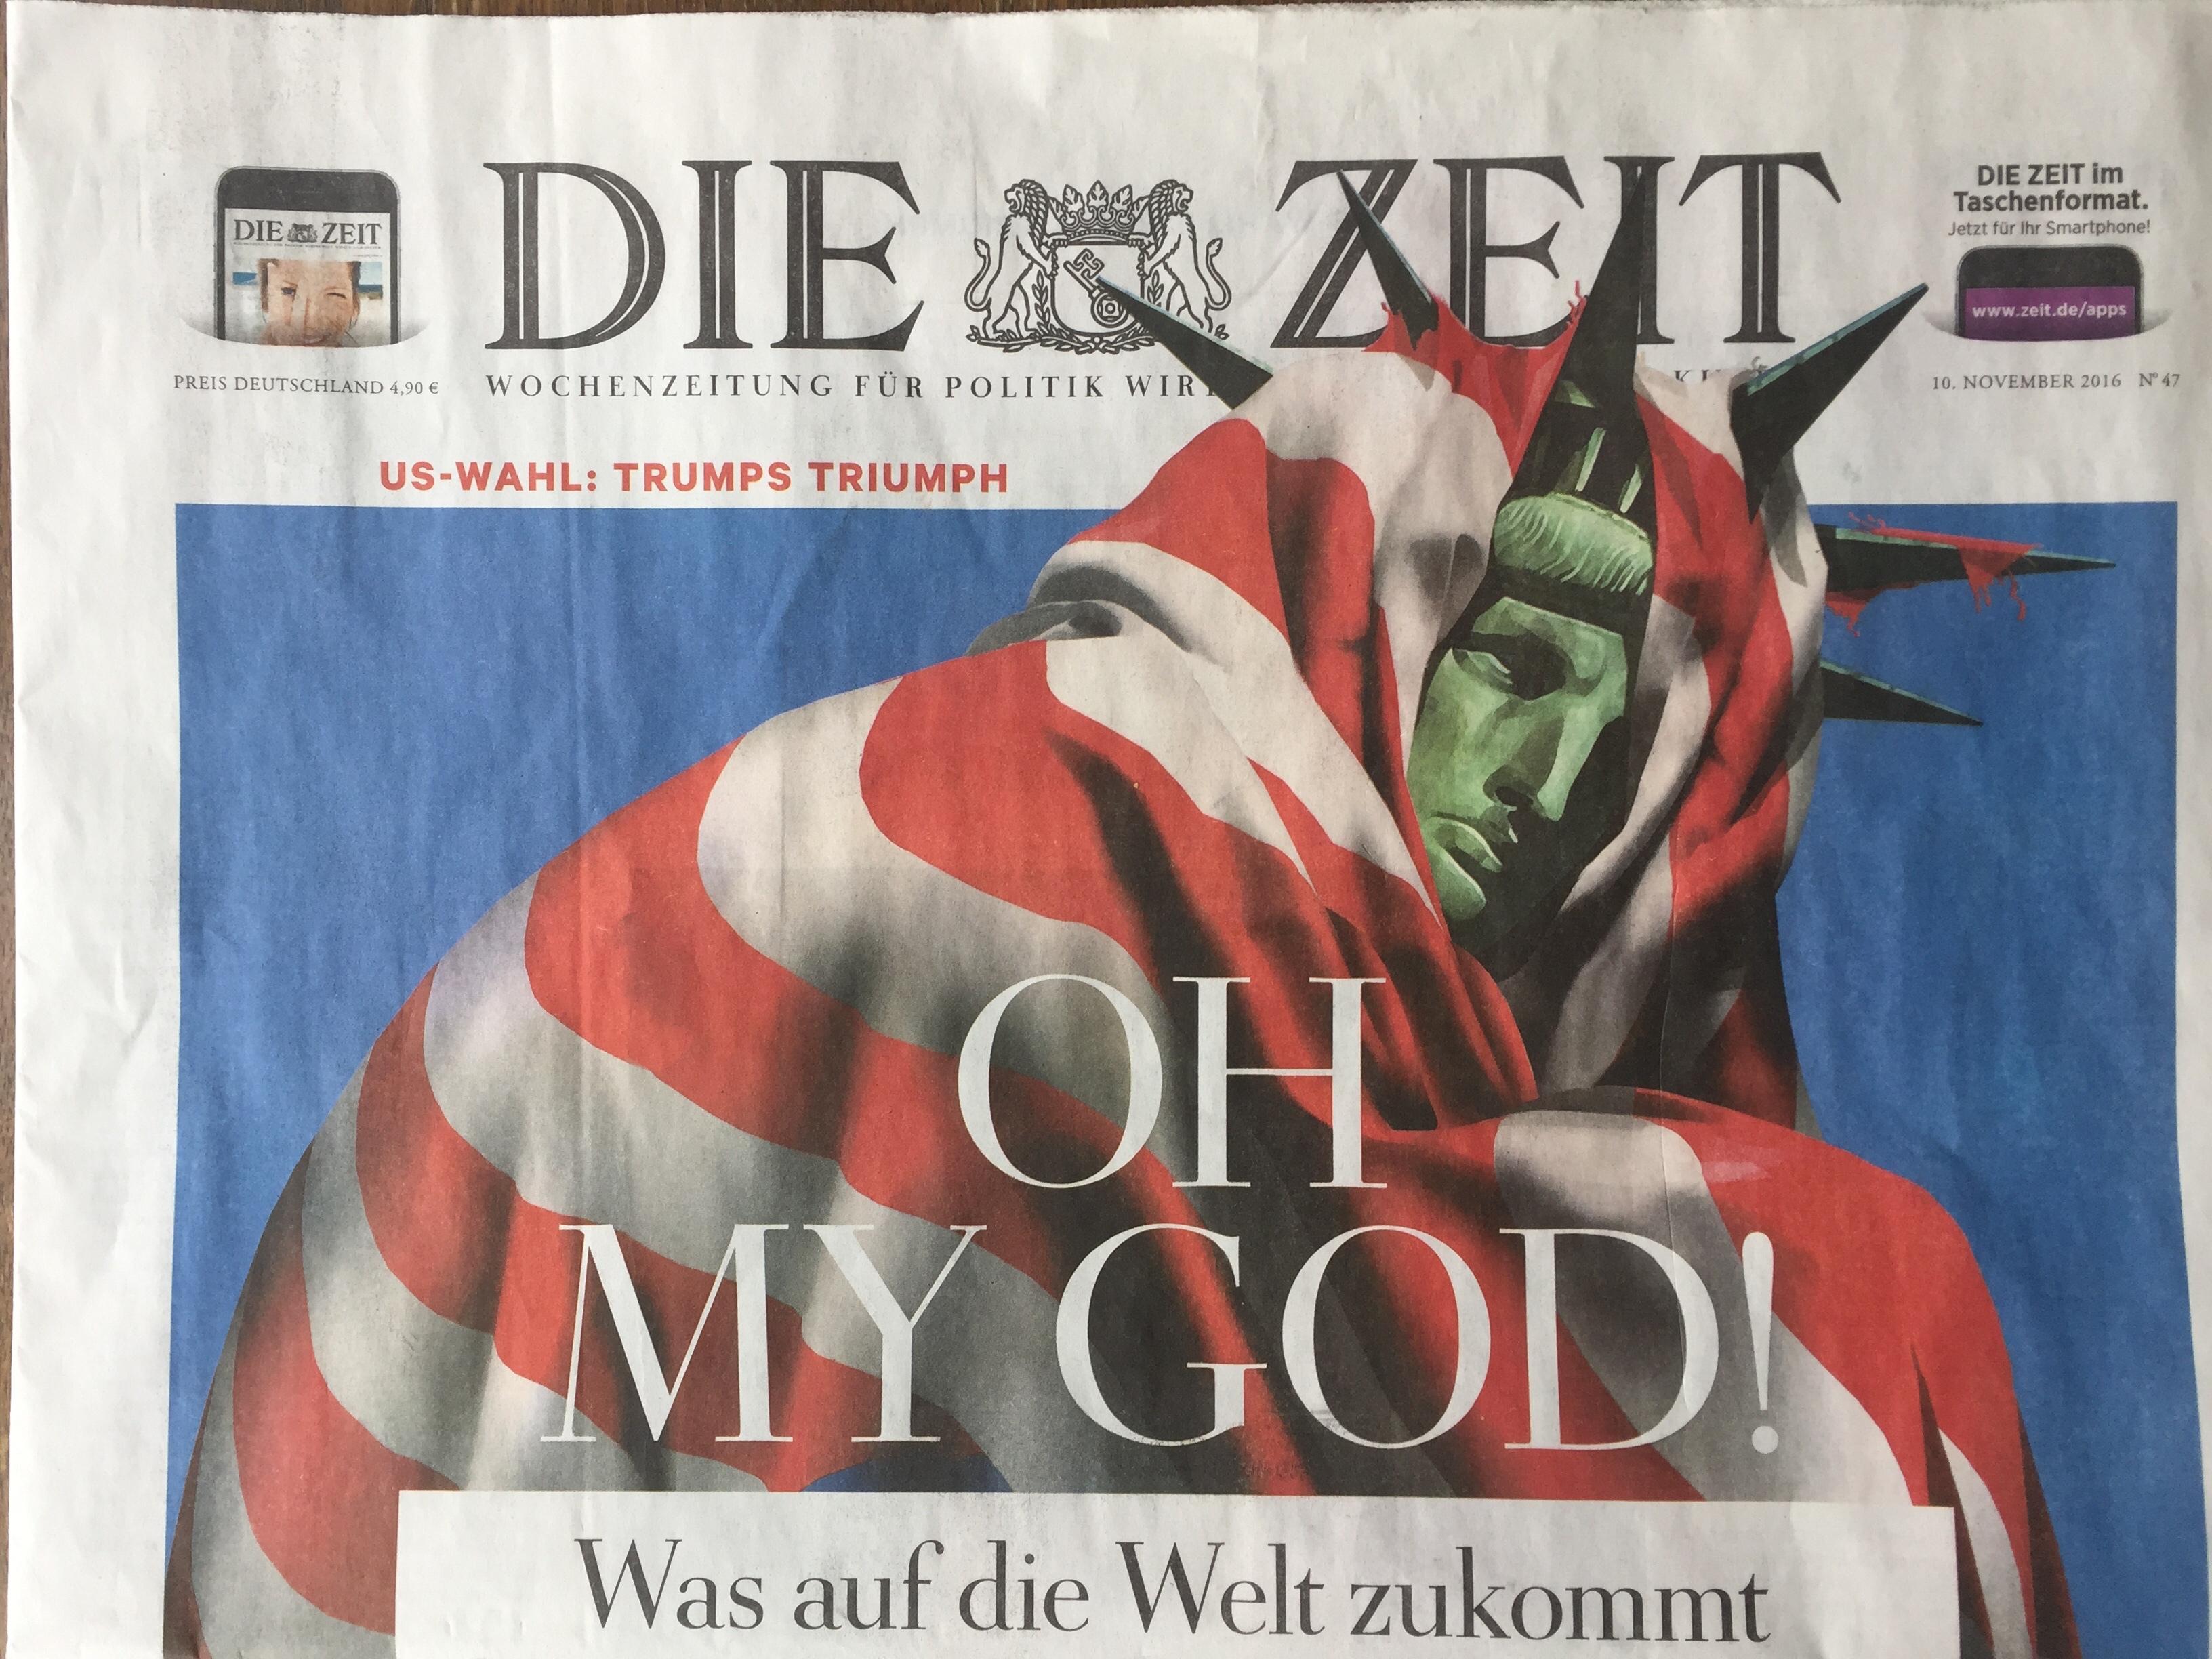 The front page of German newspaper Die Zeit, Nov. 10 2016